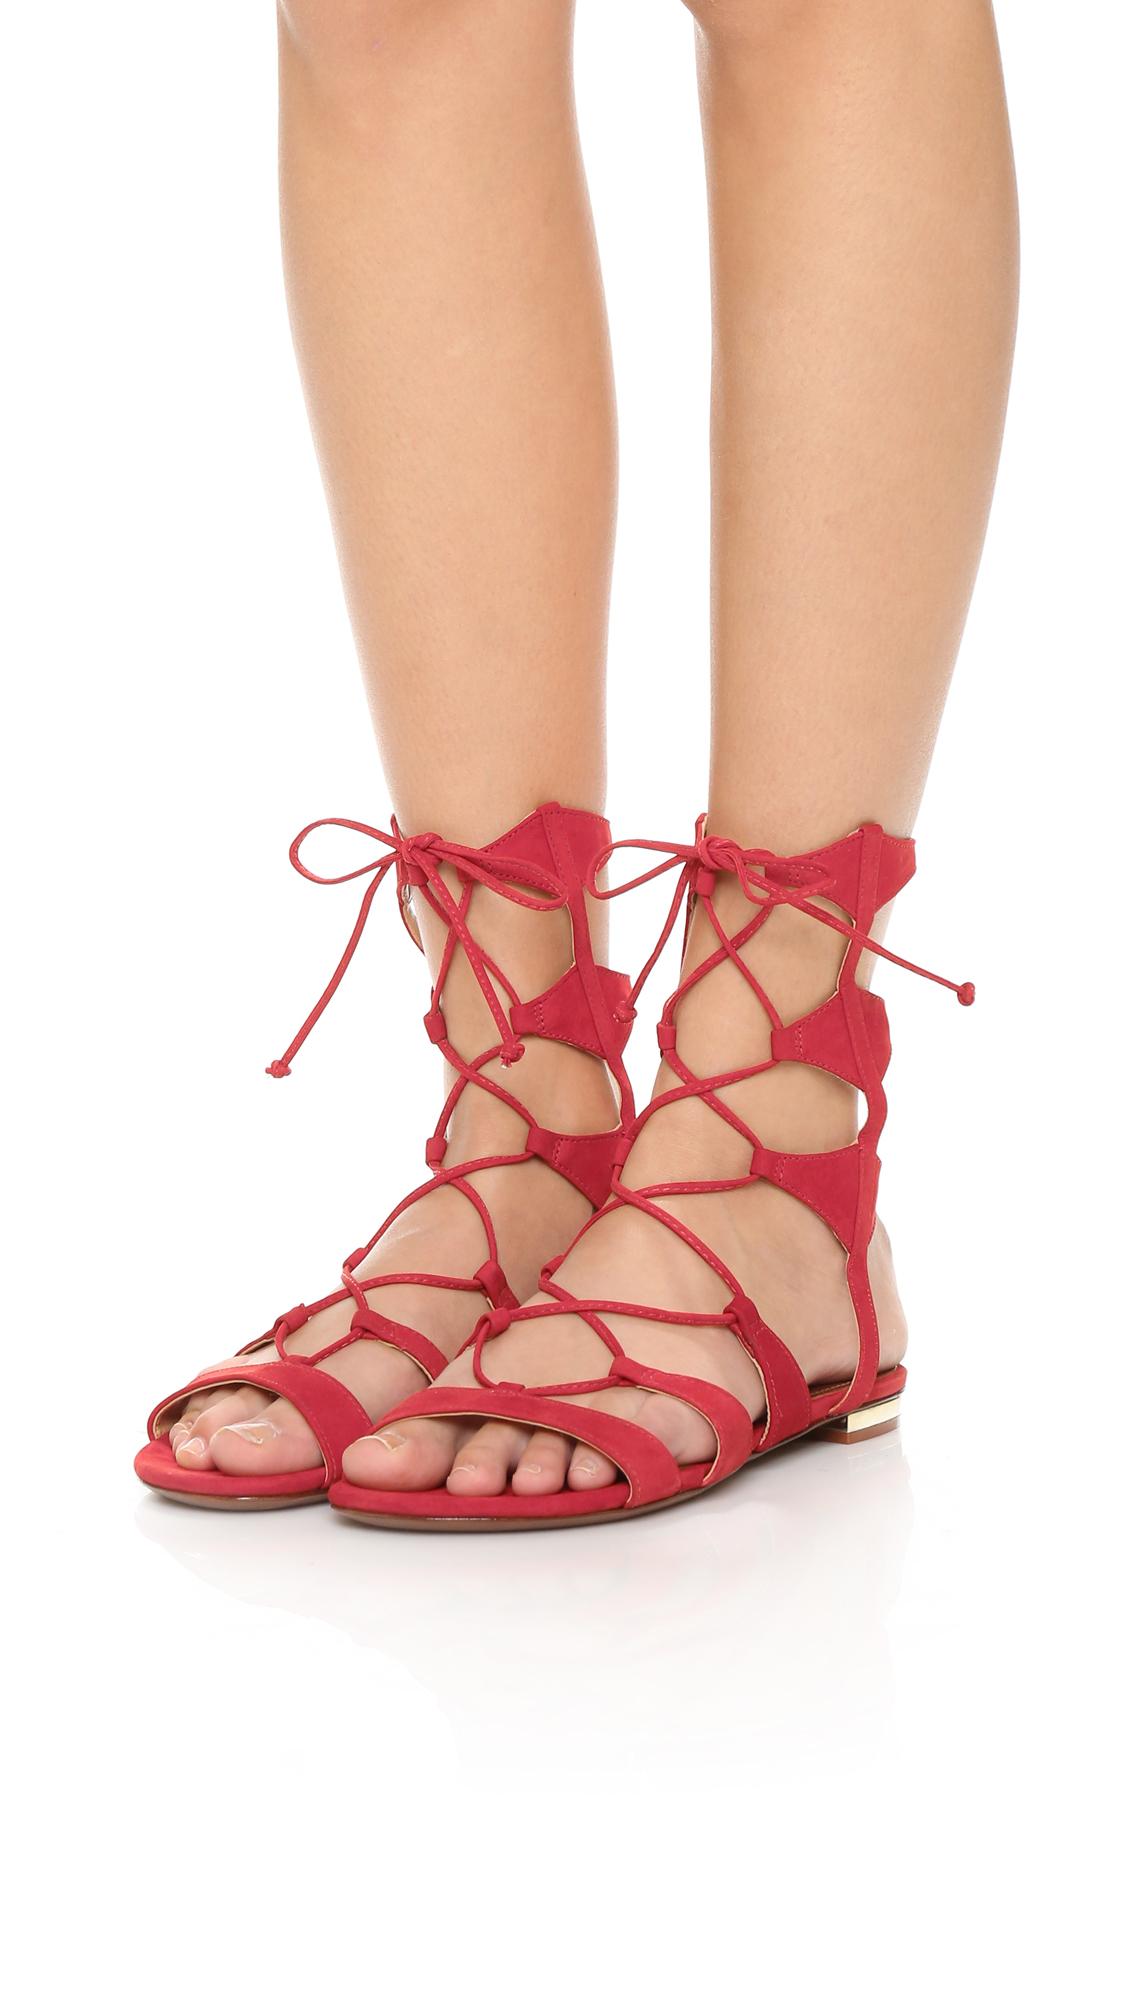 0a16edb7535 Schutz Erlina Lace Up Sandals - Scarlet in Red - Lyst